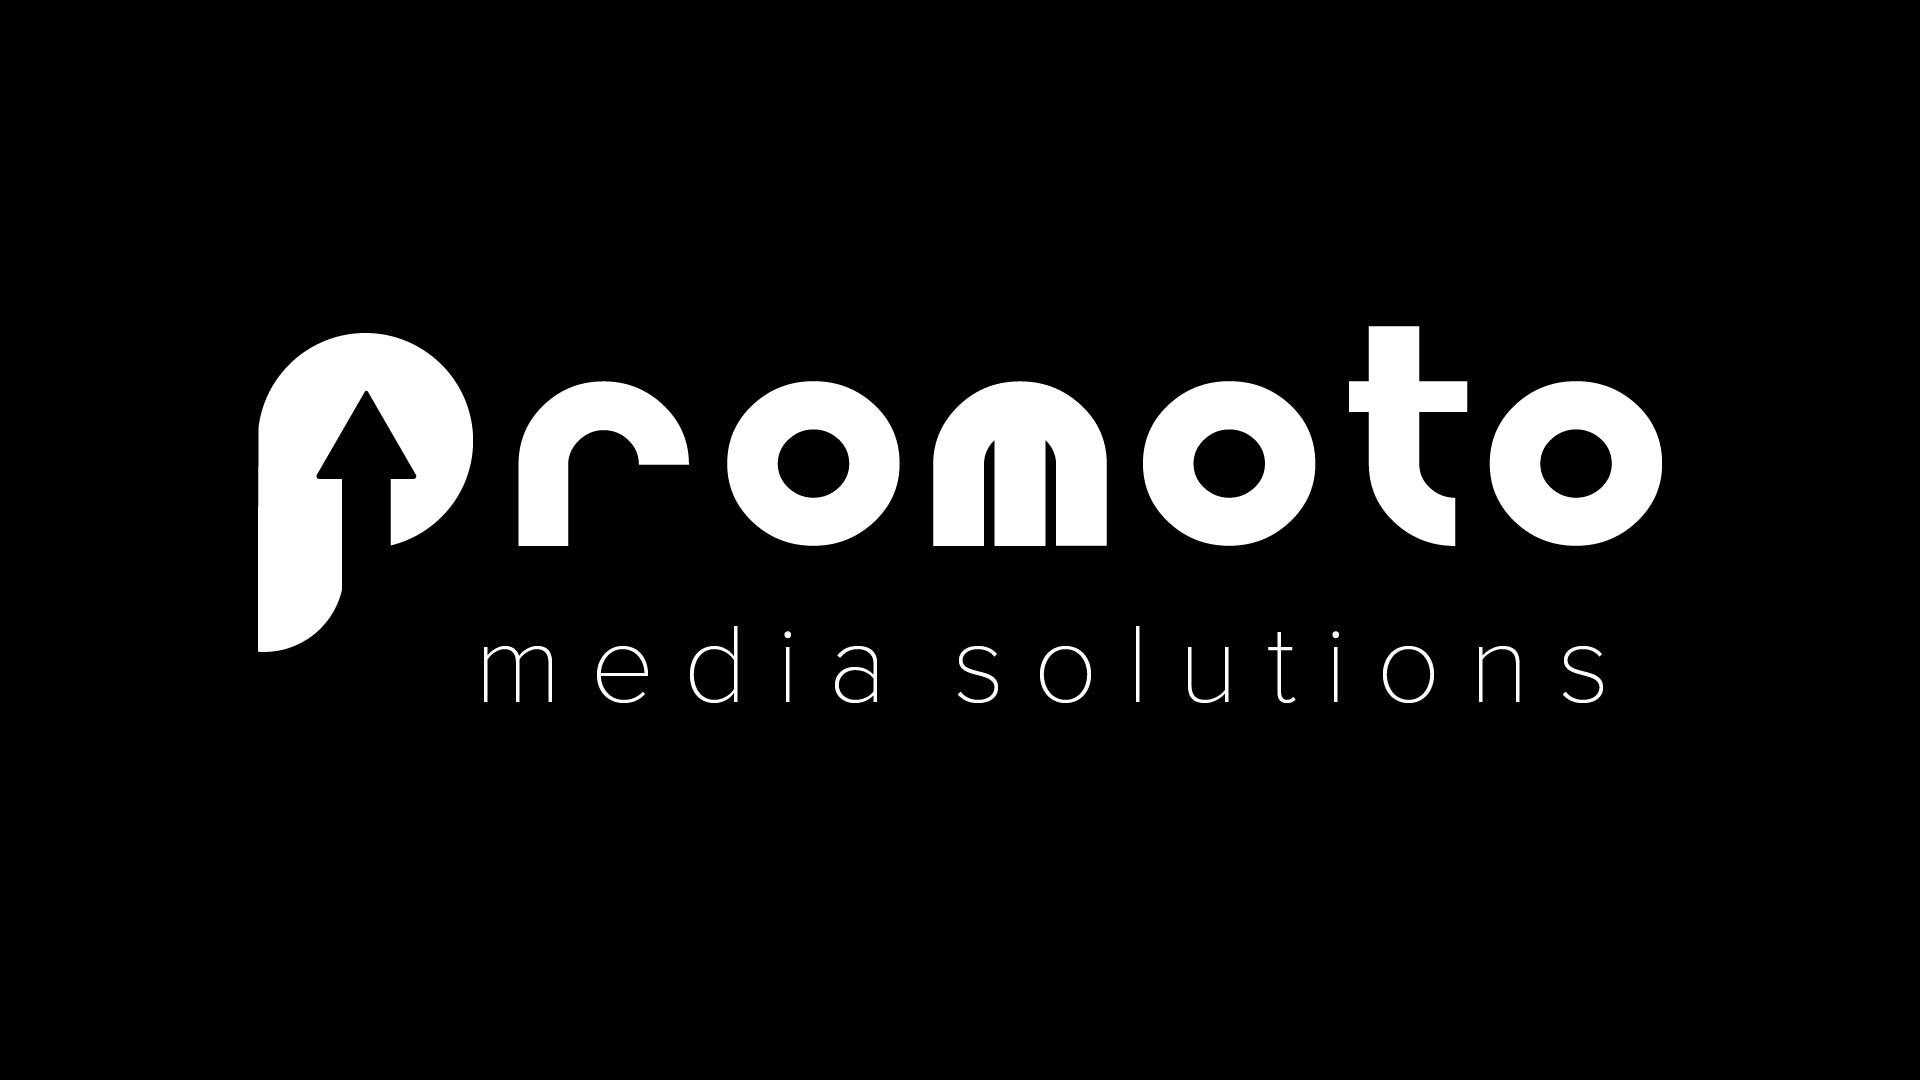 promoto-02.jpg